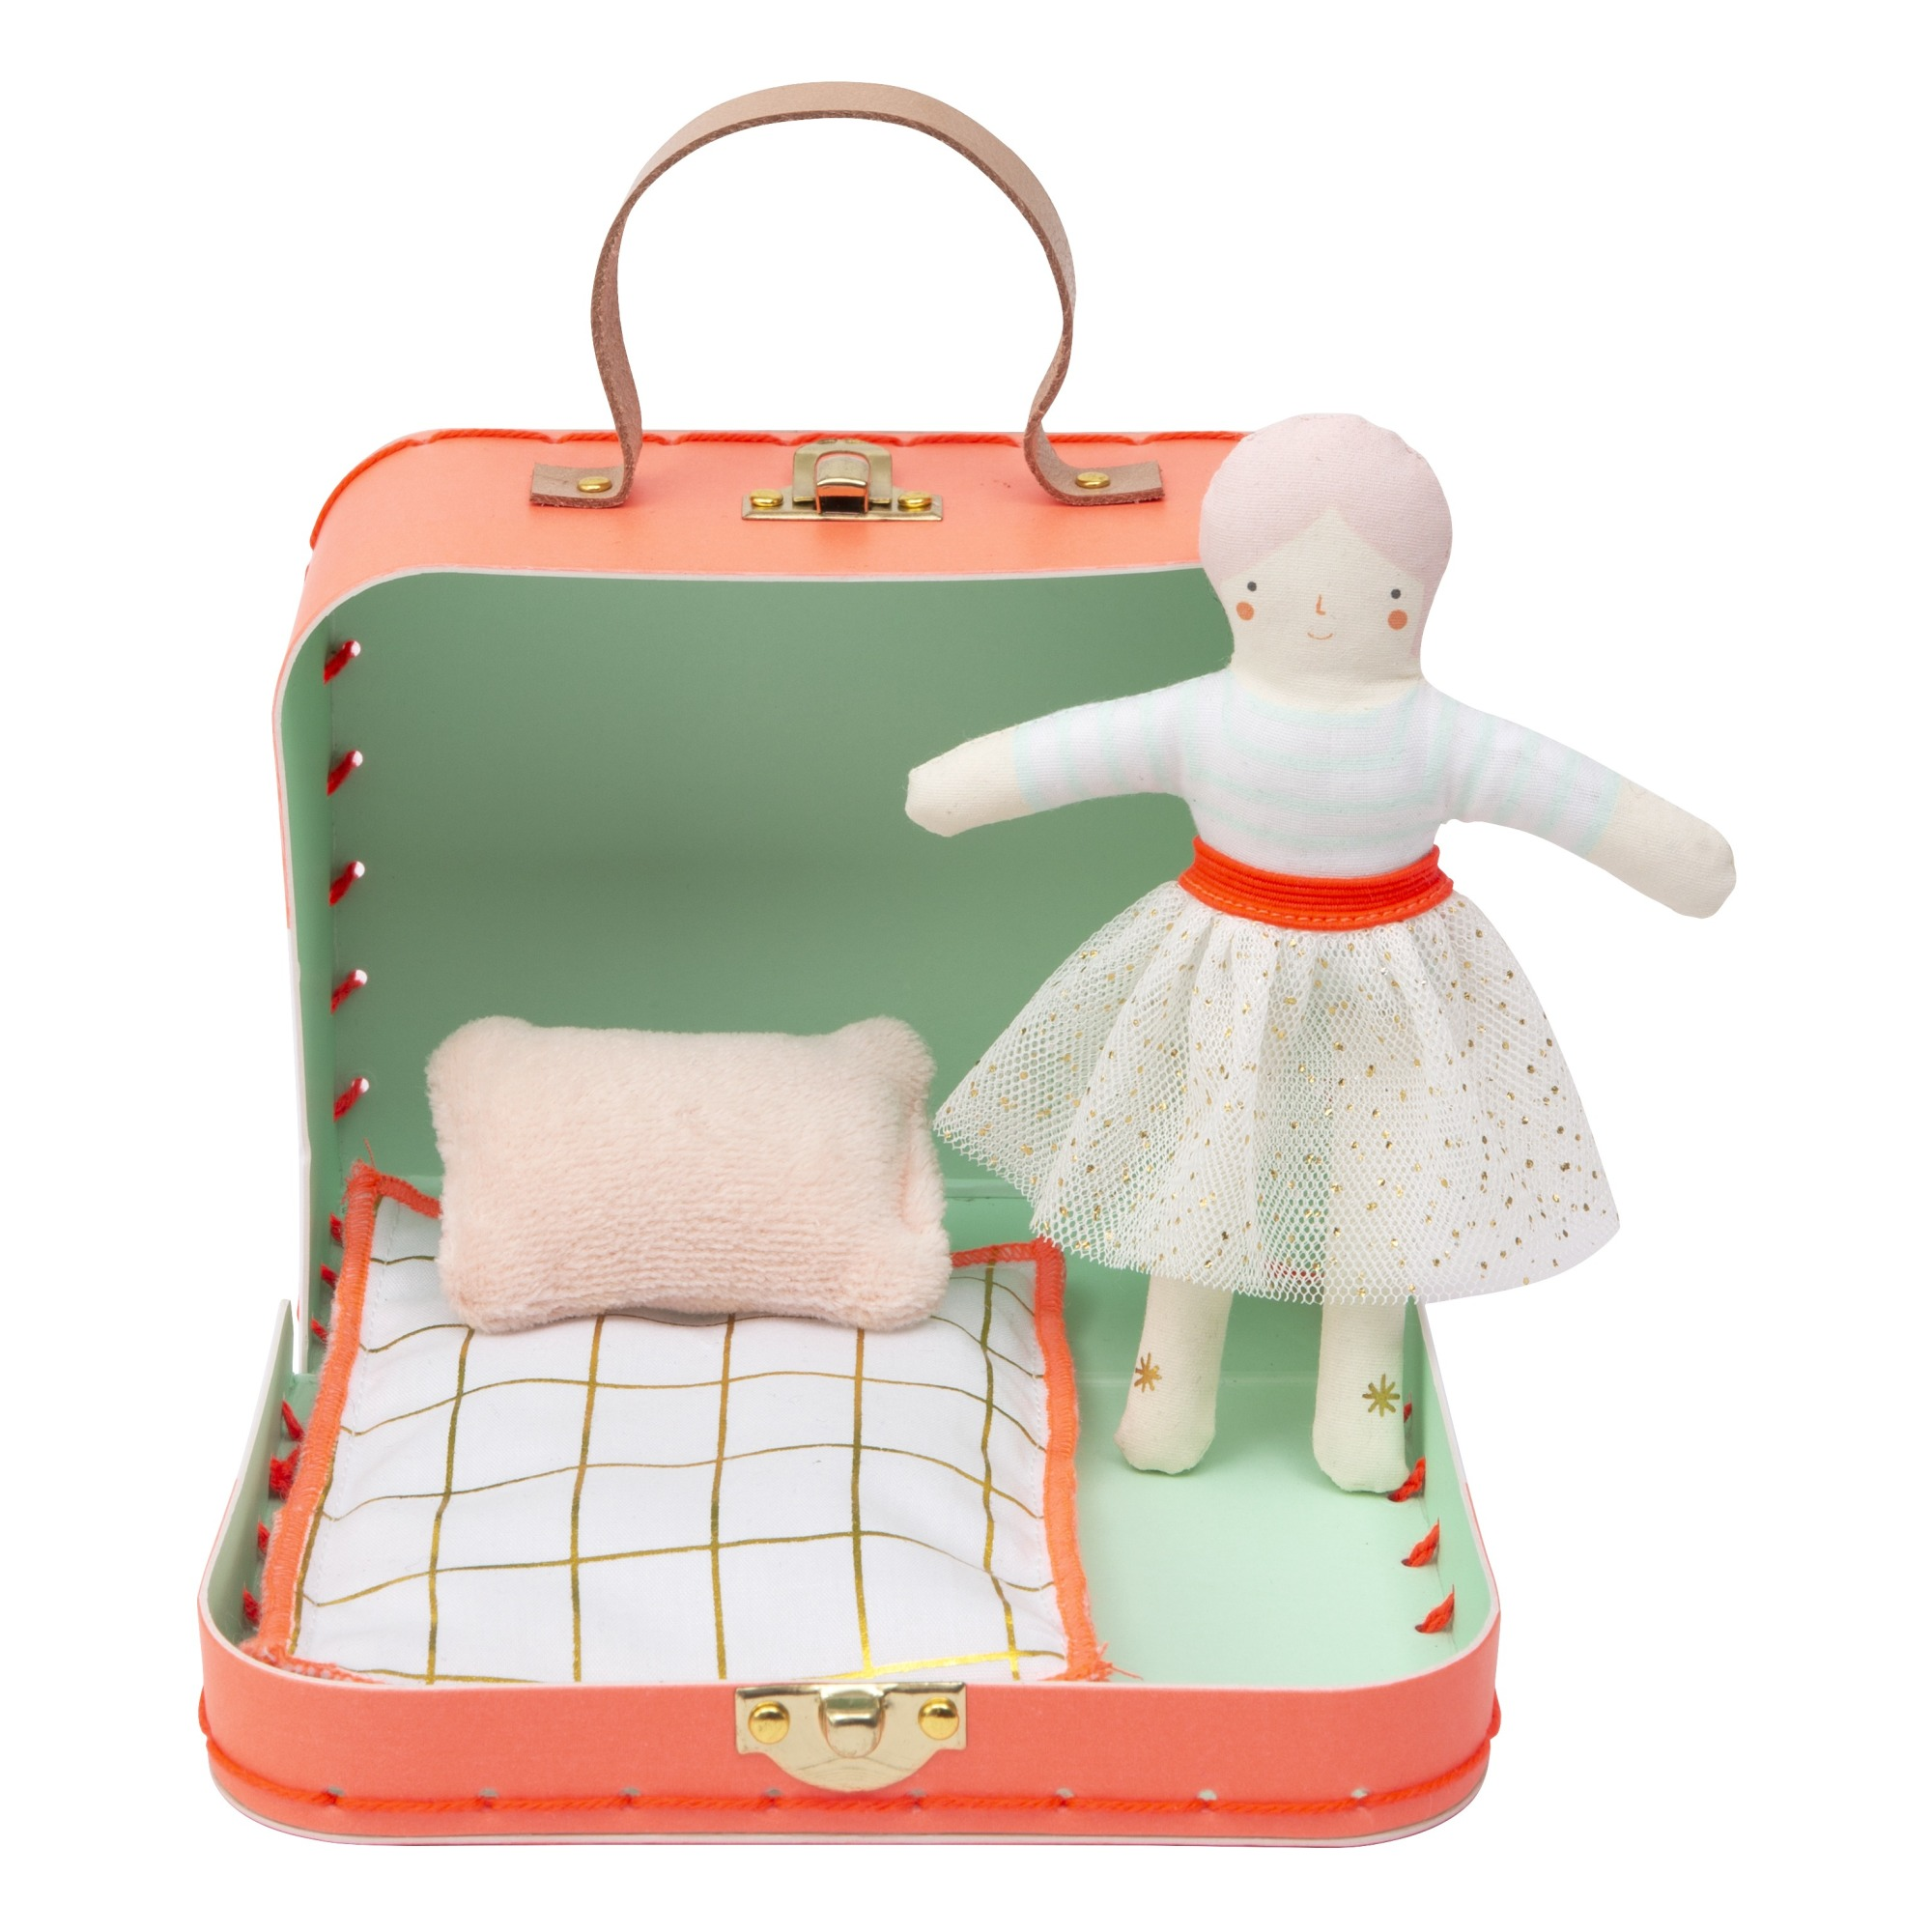 Meri Meri - Valise avec poupée Matilda - Corail